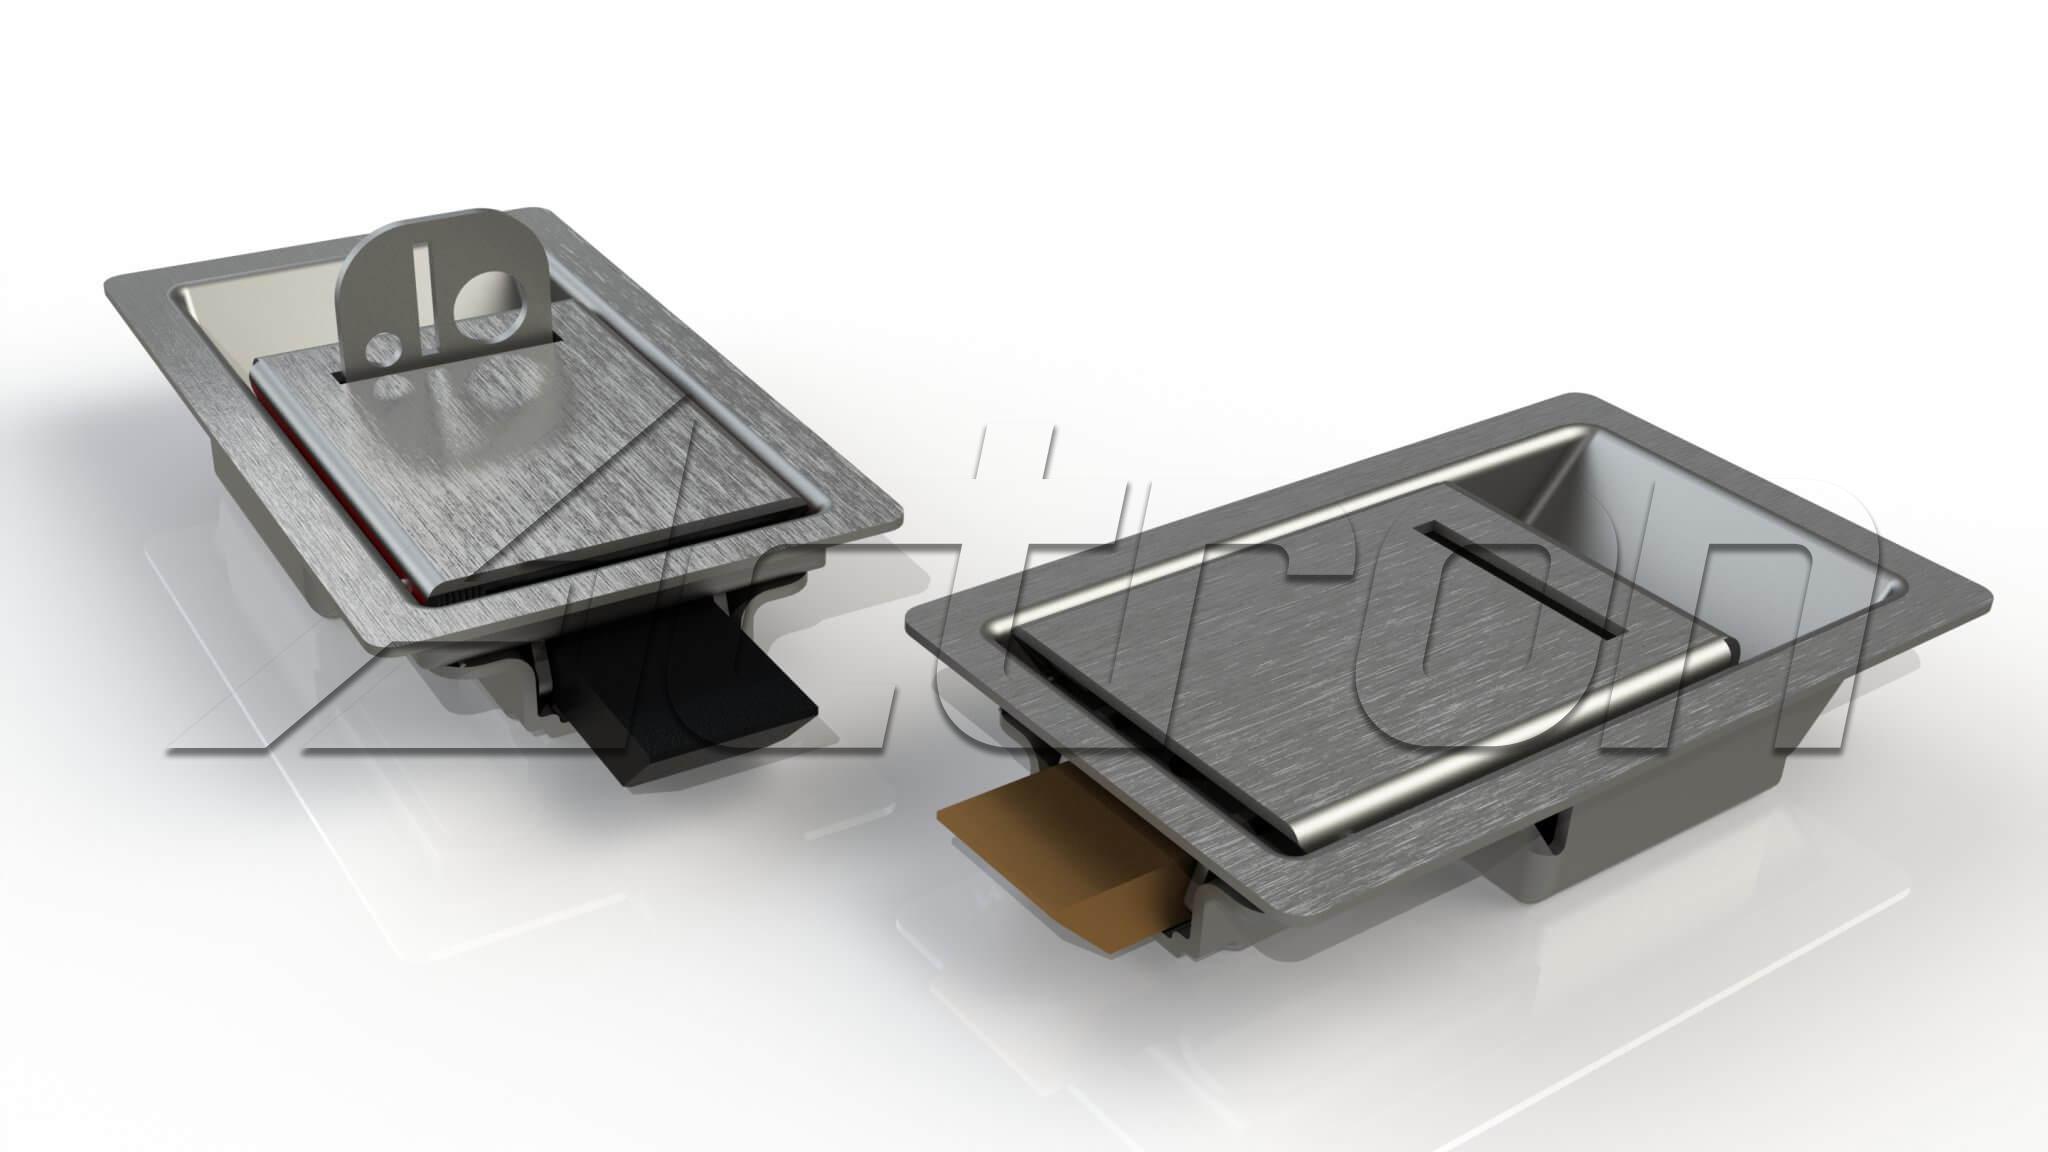 latch-assy-8211-paddle-4114-a23060.jpg